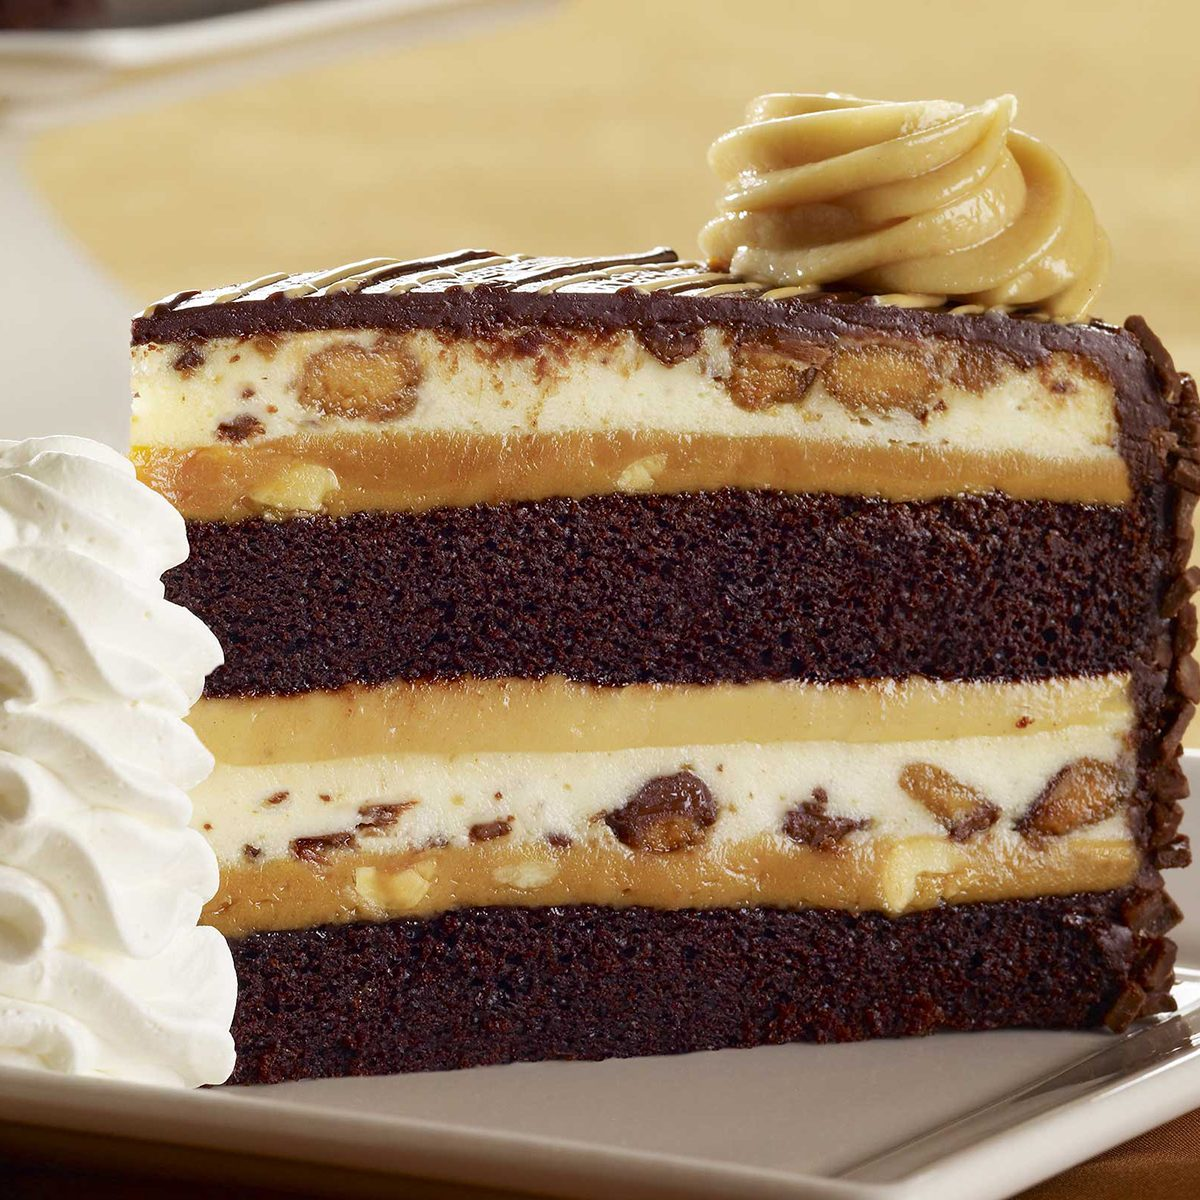 Peanutbutter chocolate cheesecake